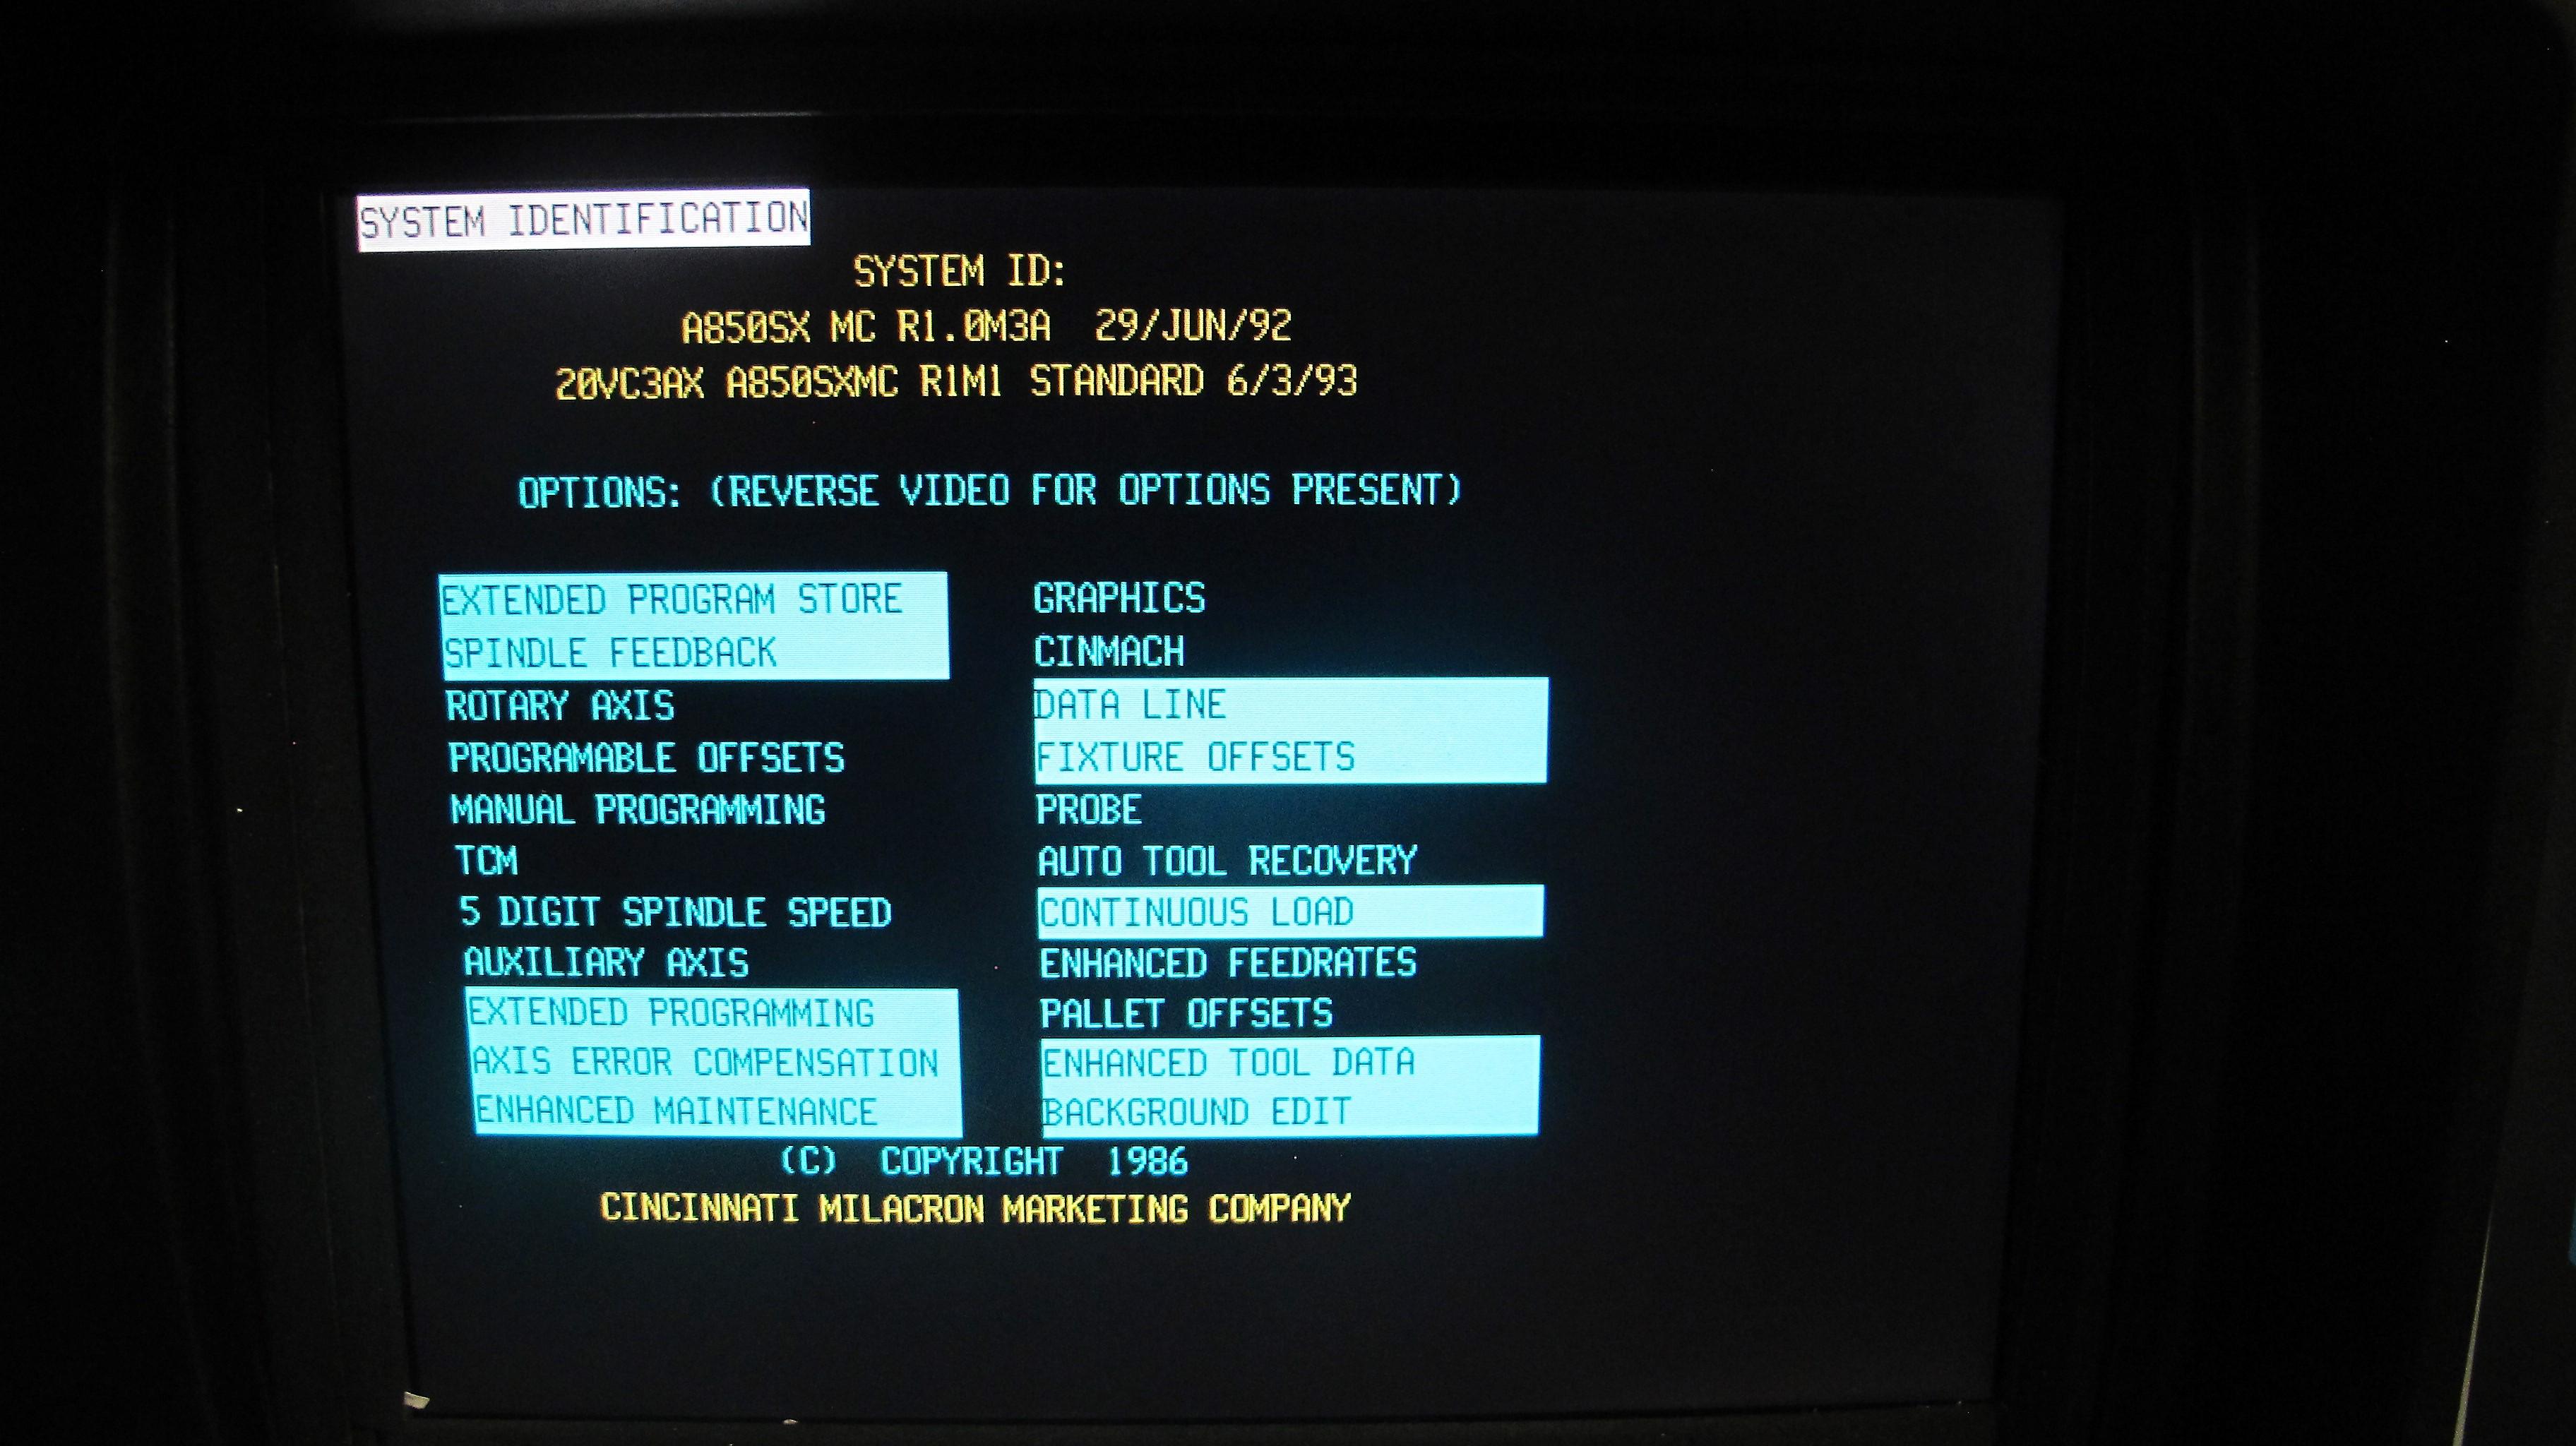 "CINCINNATI MILACRON20VC CNC VERTICAL MILLING MACHINING, 80"" x 30"" TABLE, ACRAMATIC 850SX CNC - Image 7 of 20"